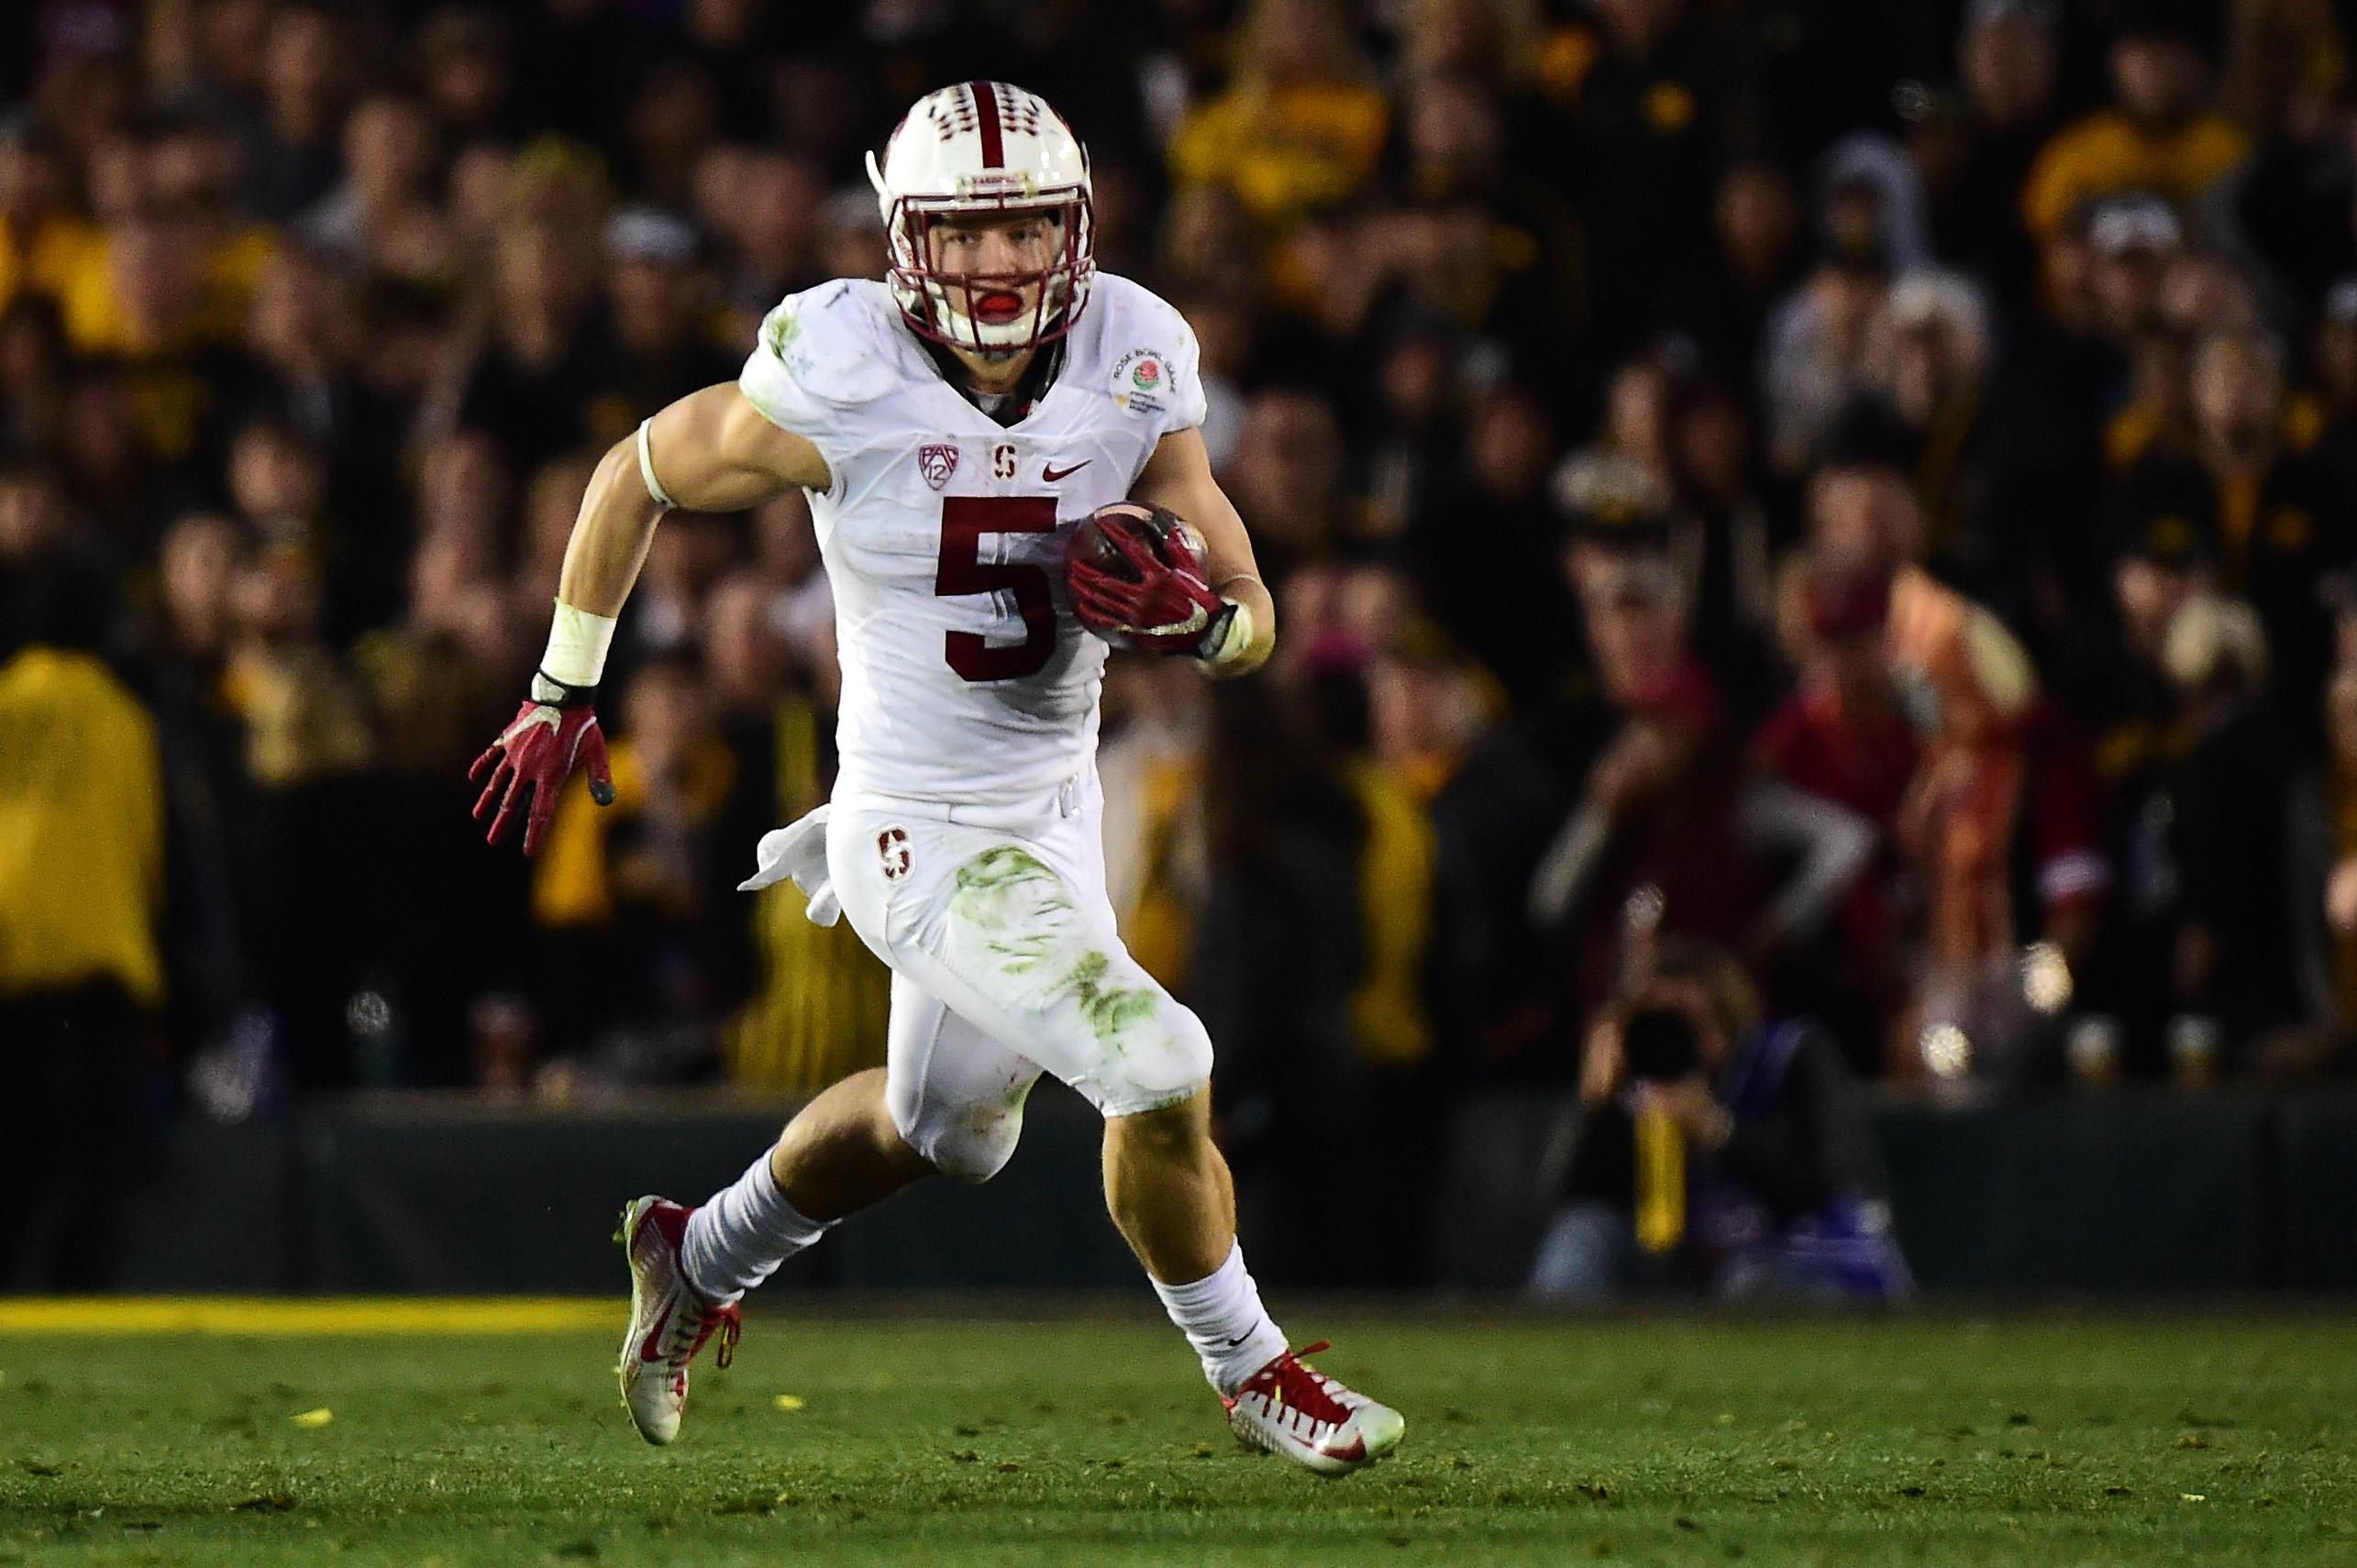 REPORT: Christian McCaffrey Declares for NFL Draft